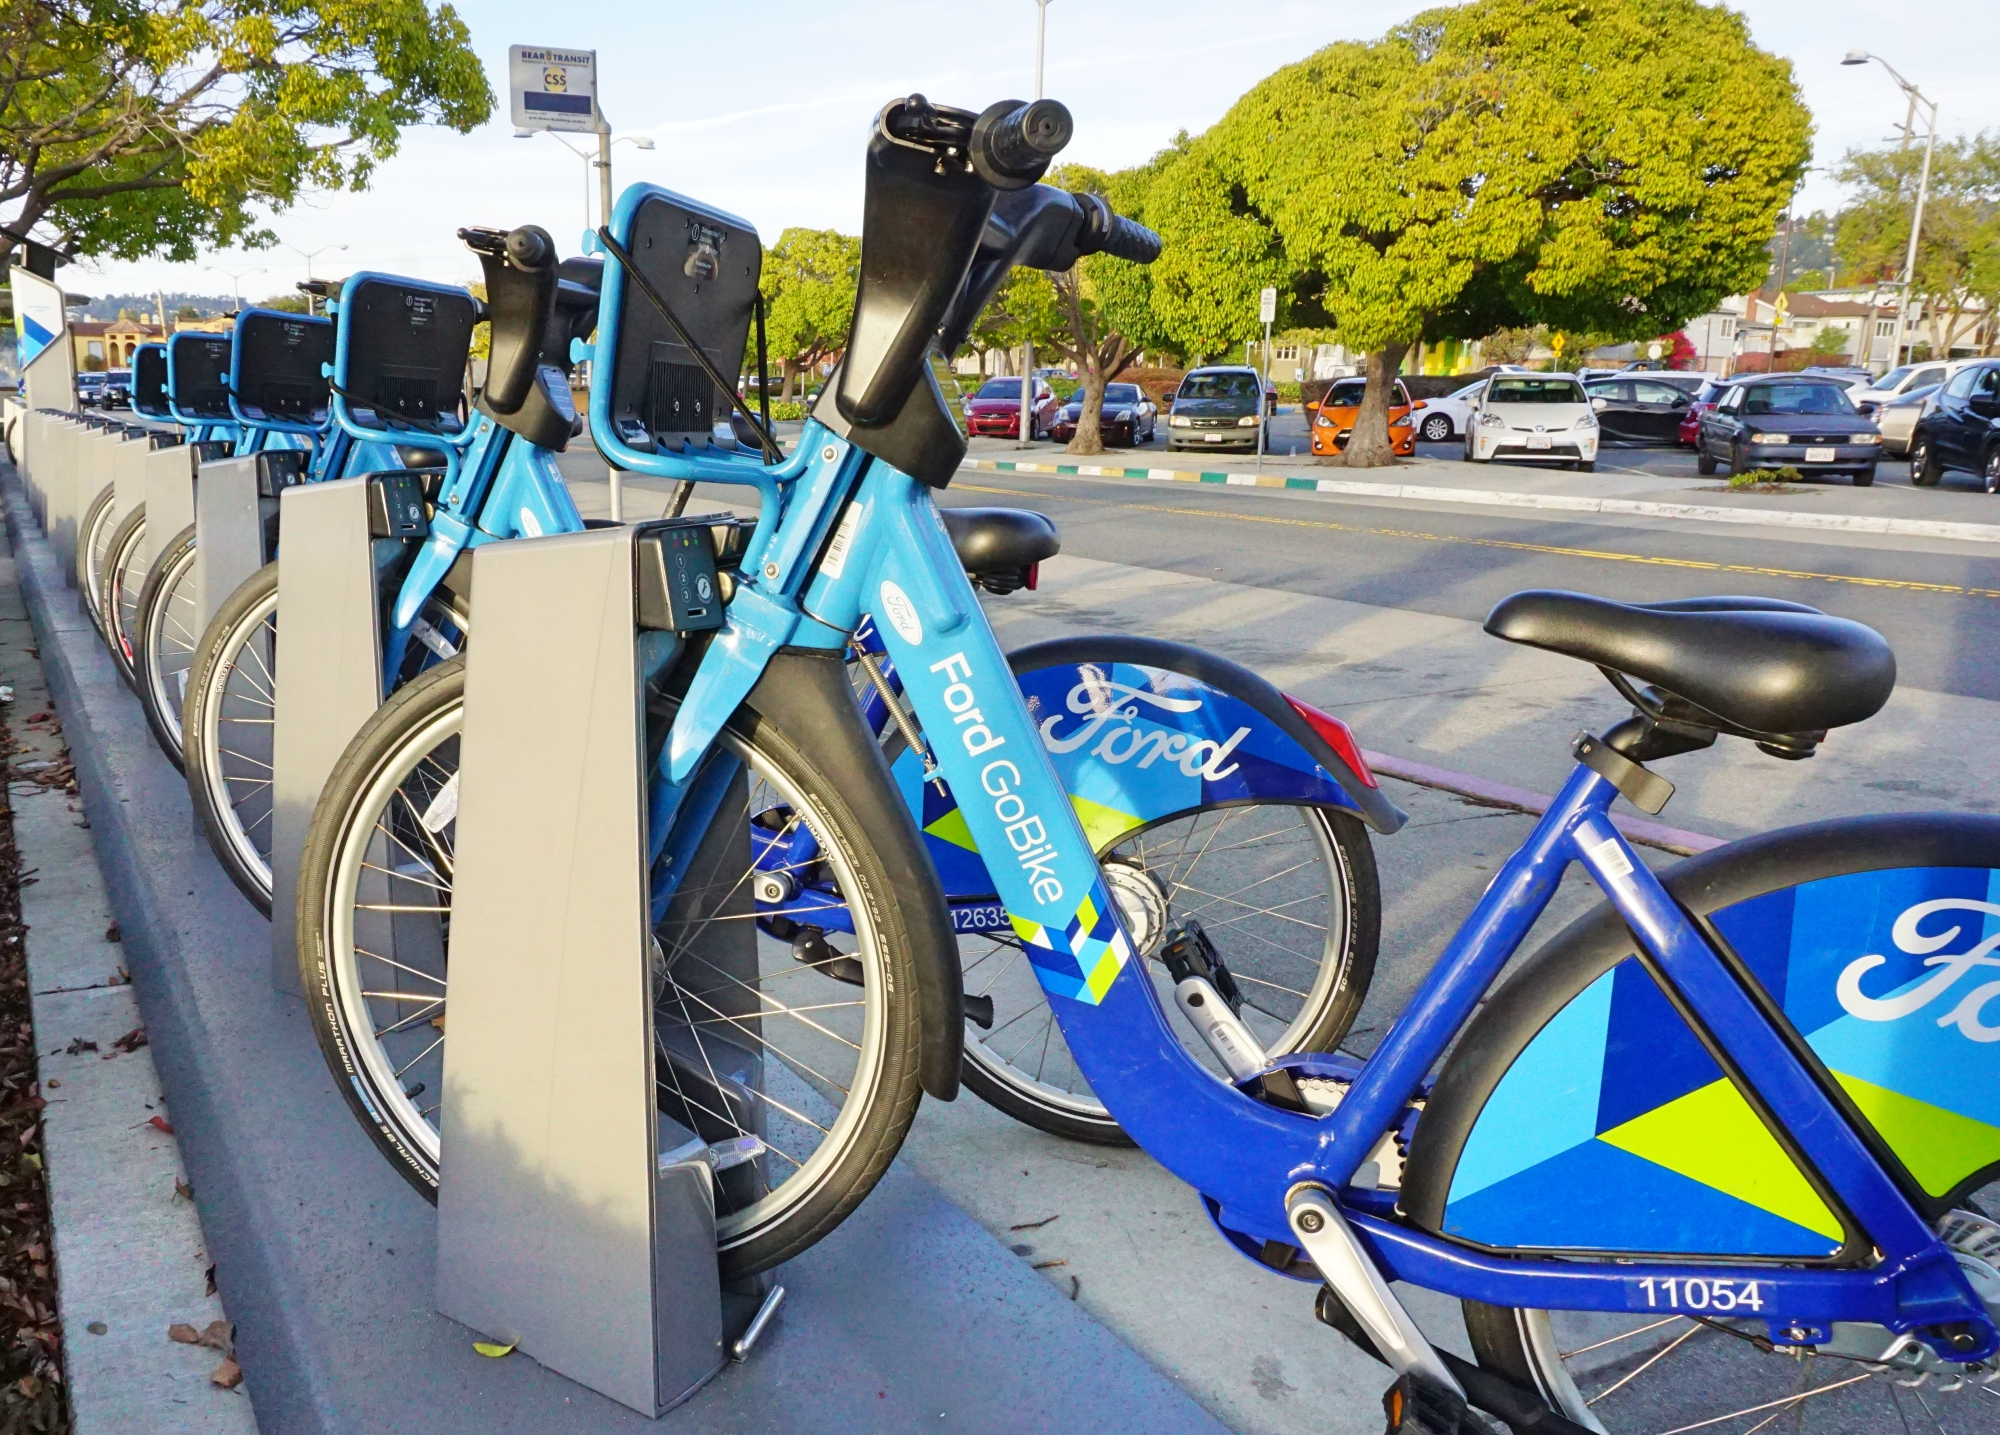 alugar bicicleta em San Francisco